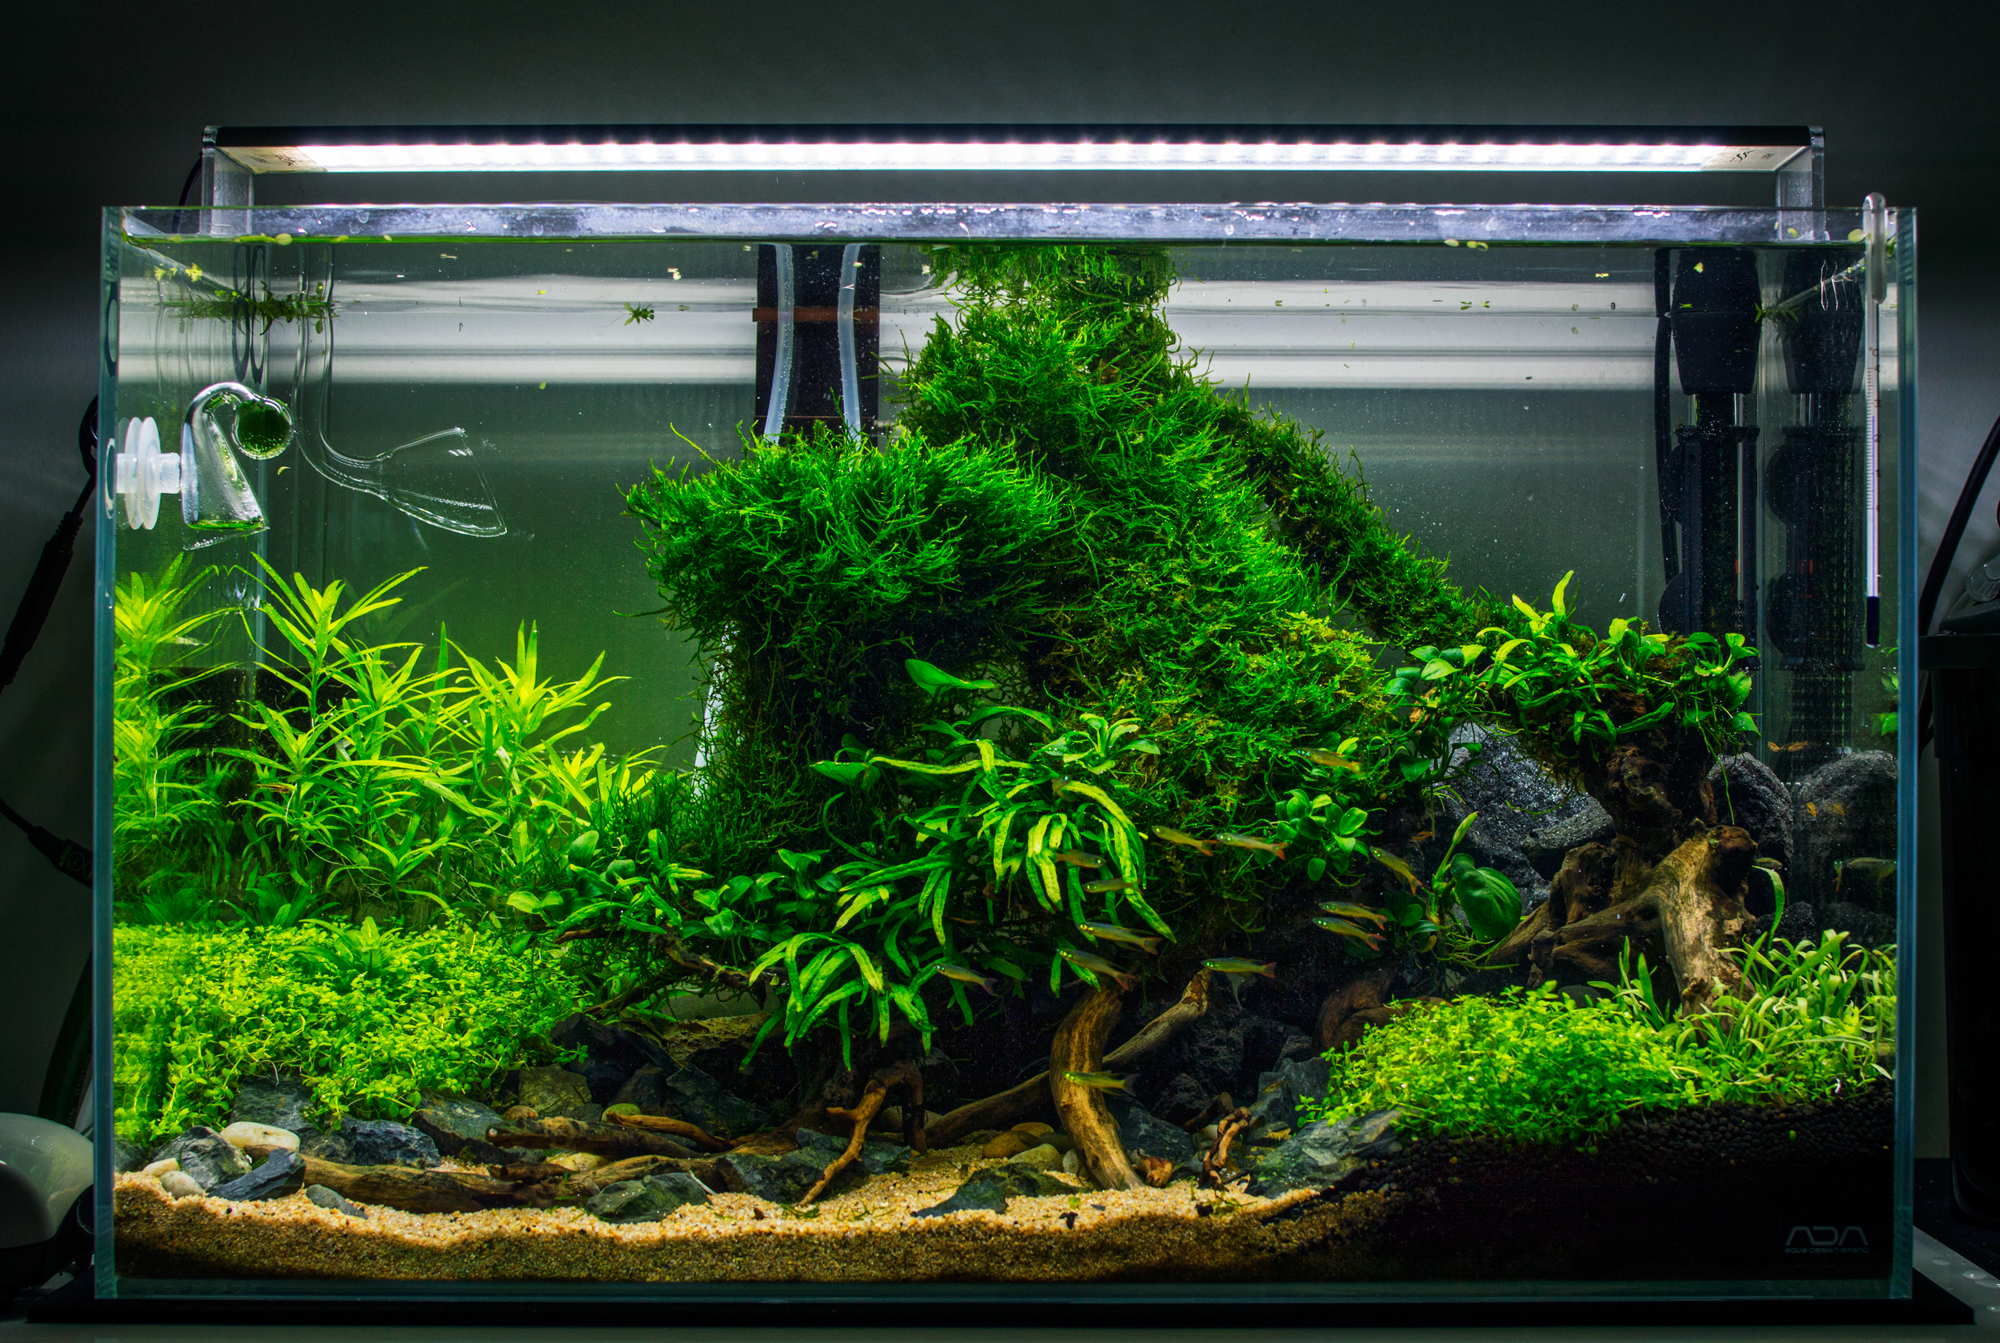 Impressionnant De Aquarium En Plastique Schème